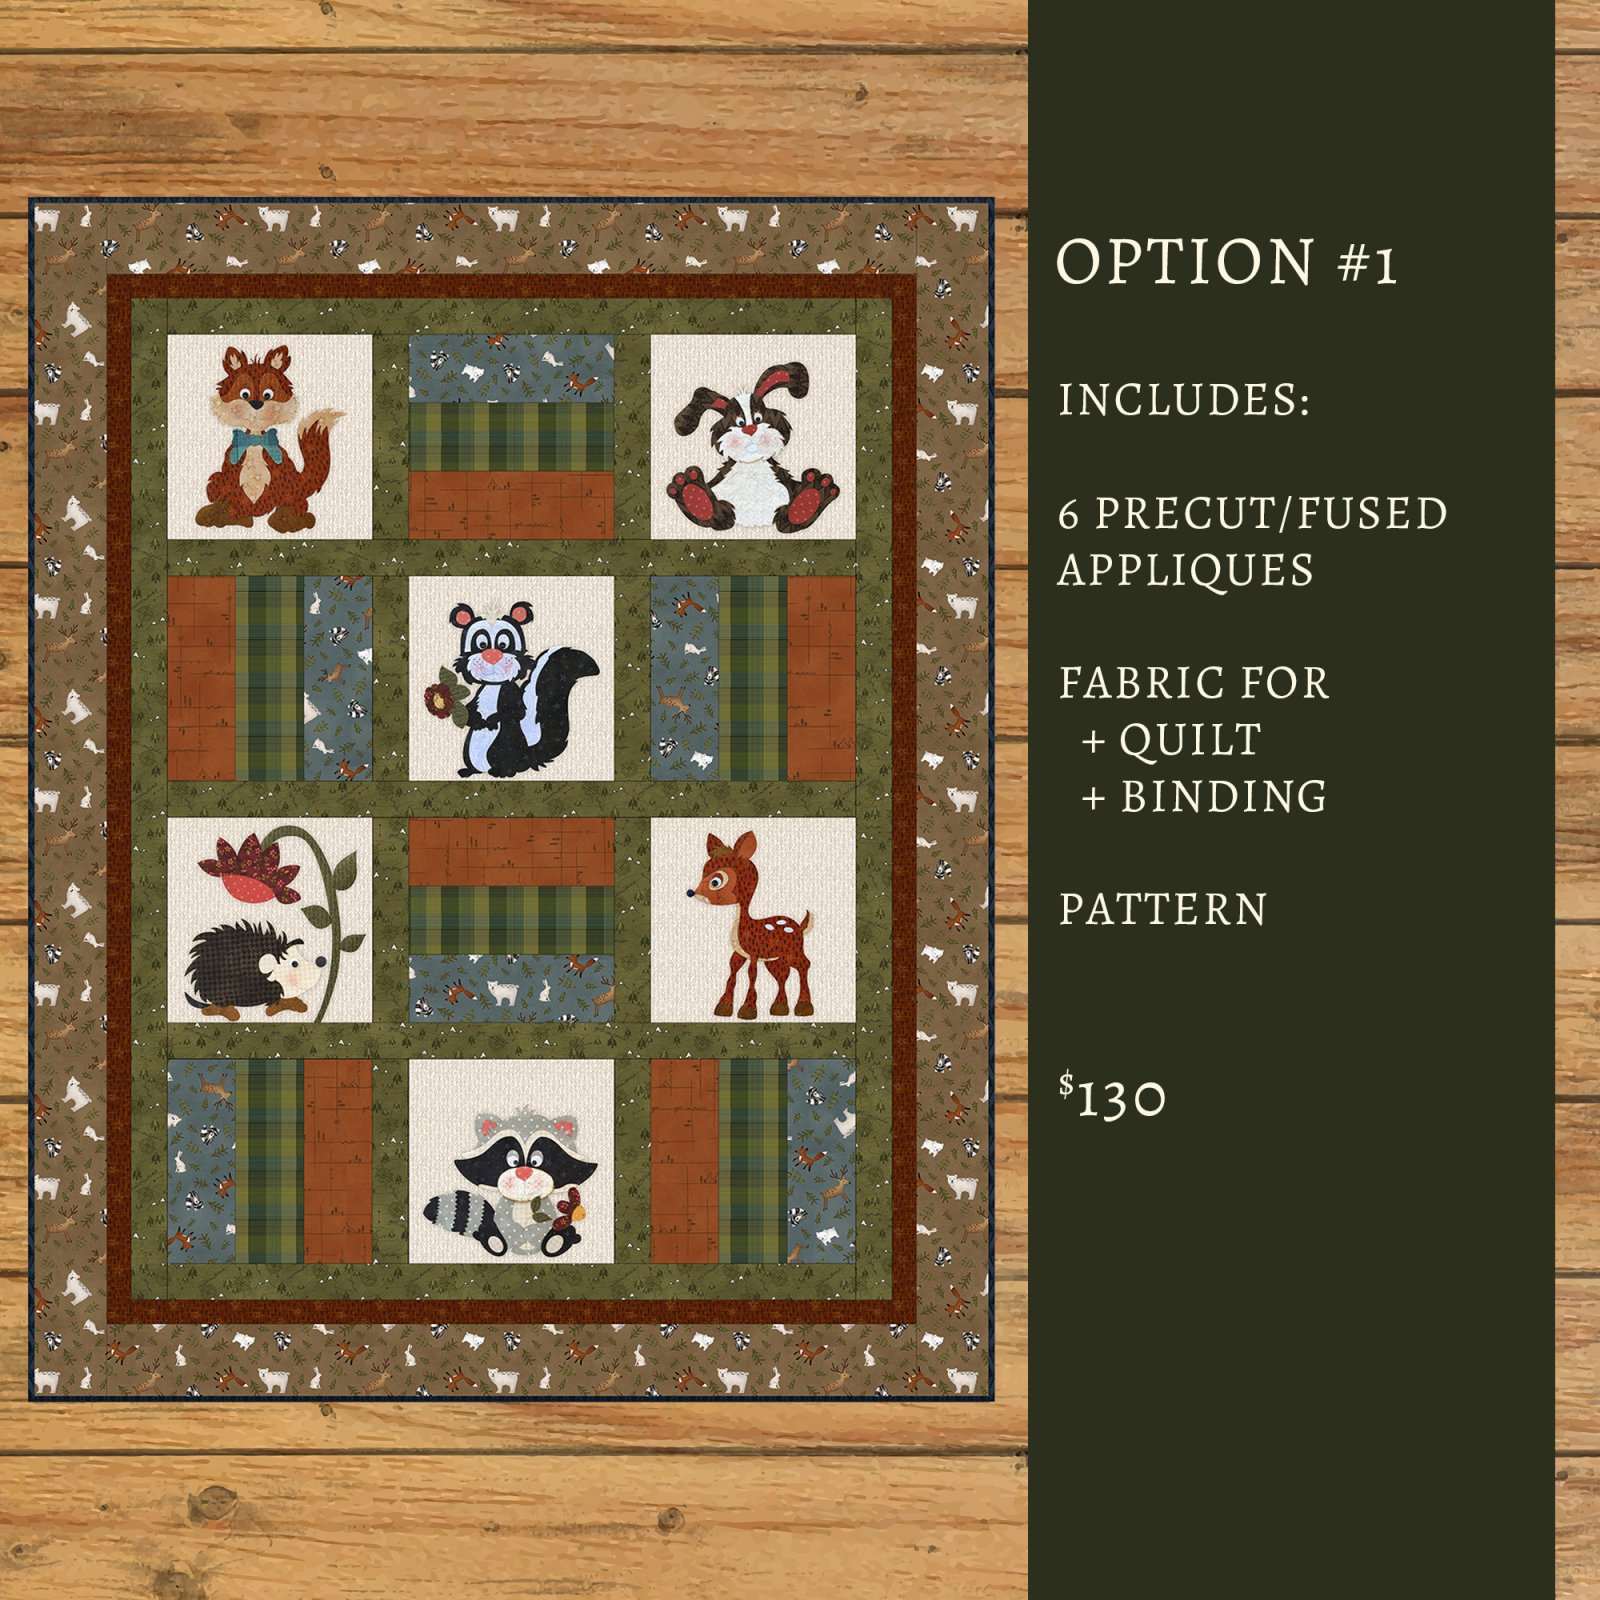 Flannel Woodland Critter Quilt Kit